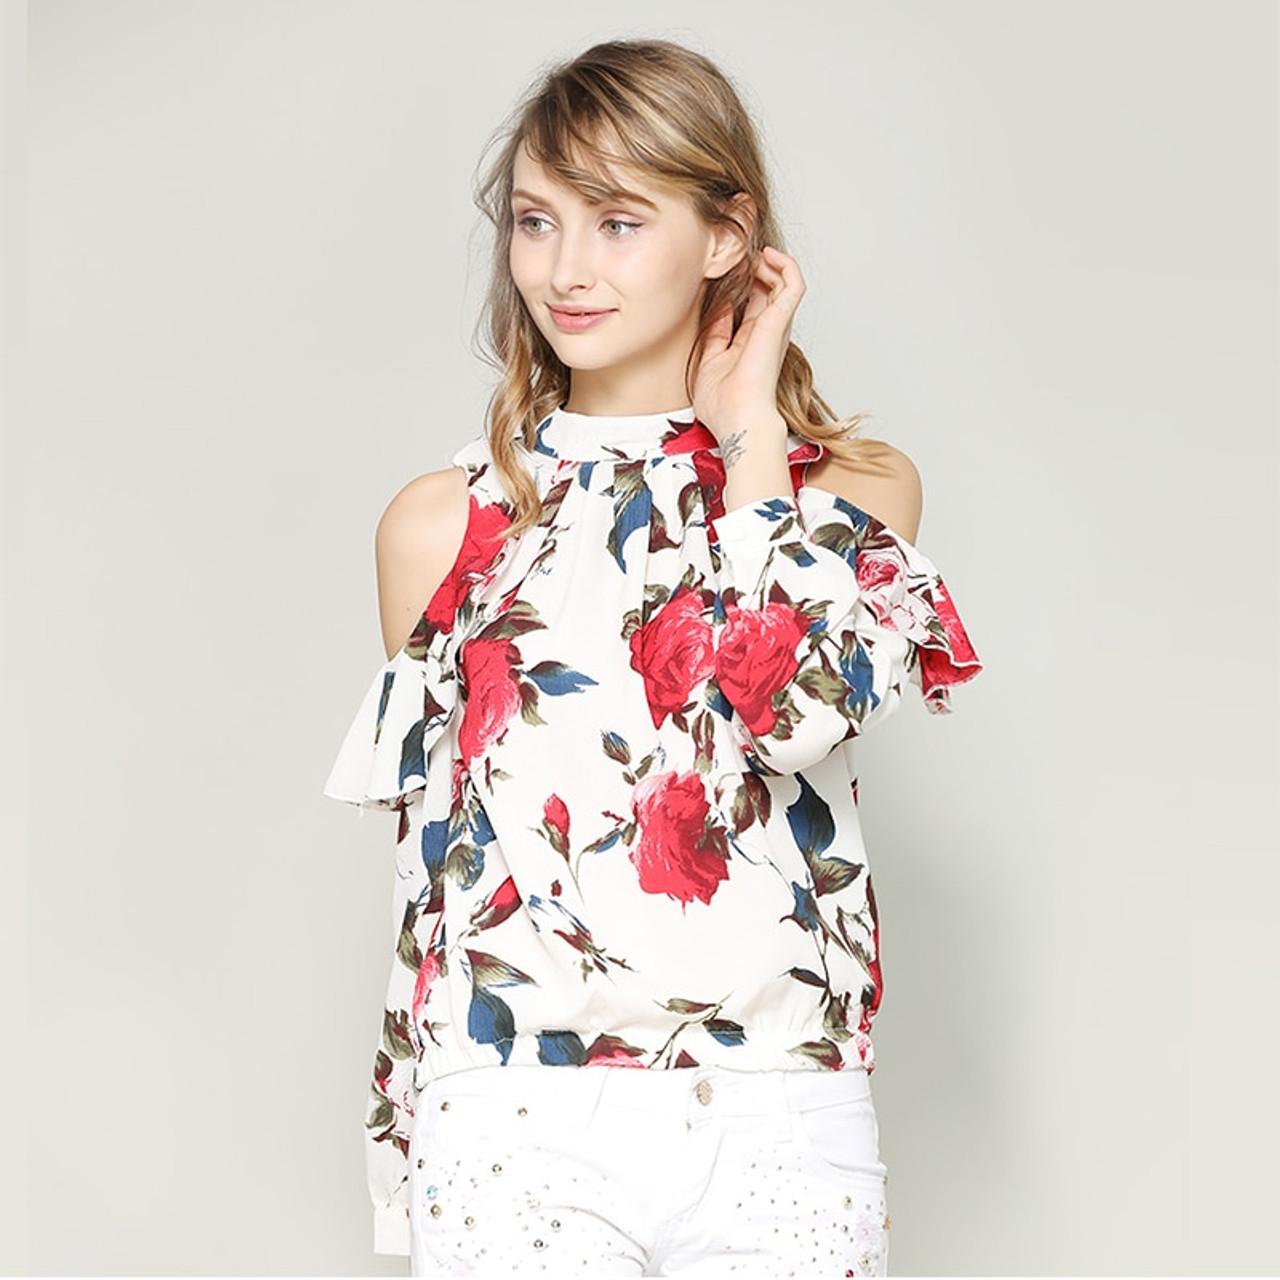 4161bb6758950 nvyou gou Women Vintage Floral Print Fashion Blouse Chiffon Cold Shoulder  Top Puff Long Sleeve Ruffle Blouse New 2018 Streetwear